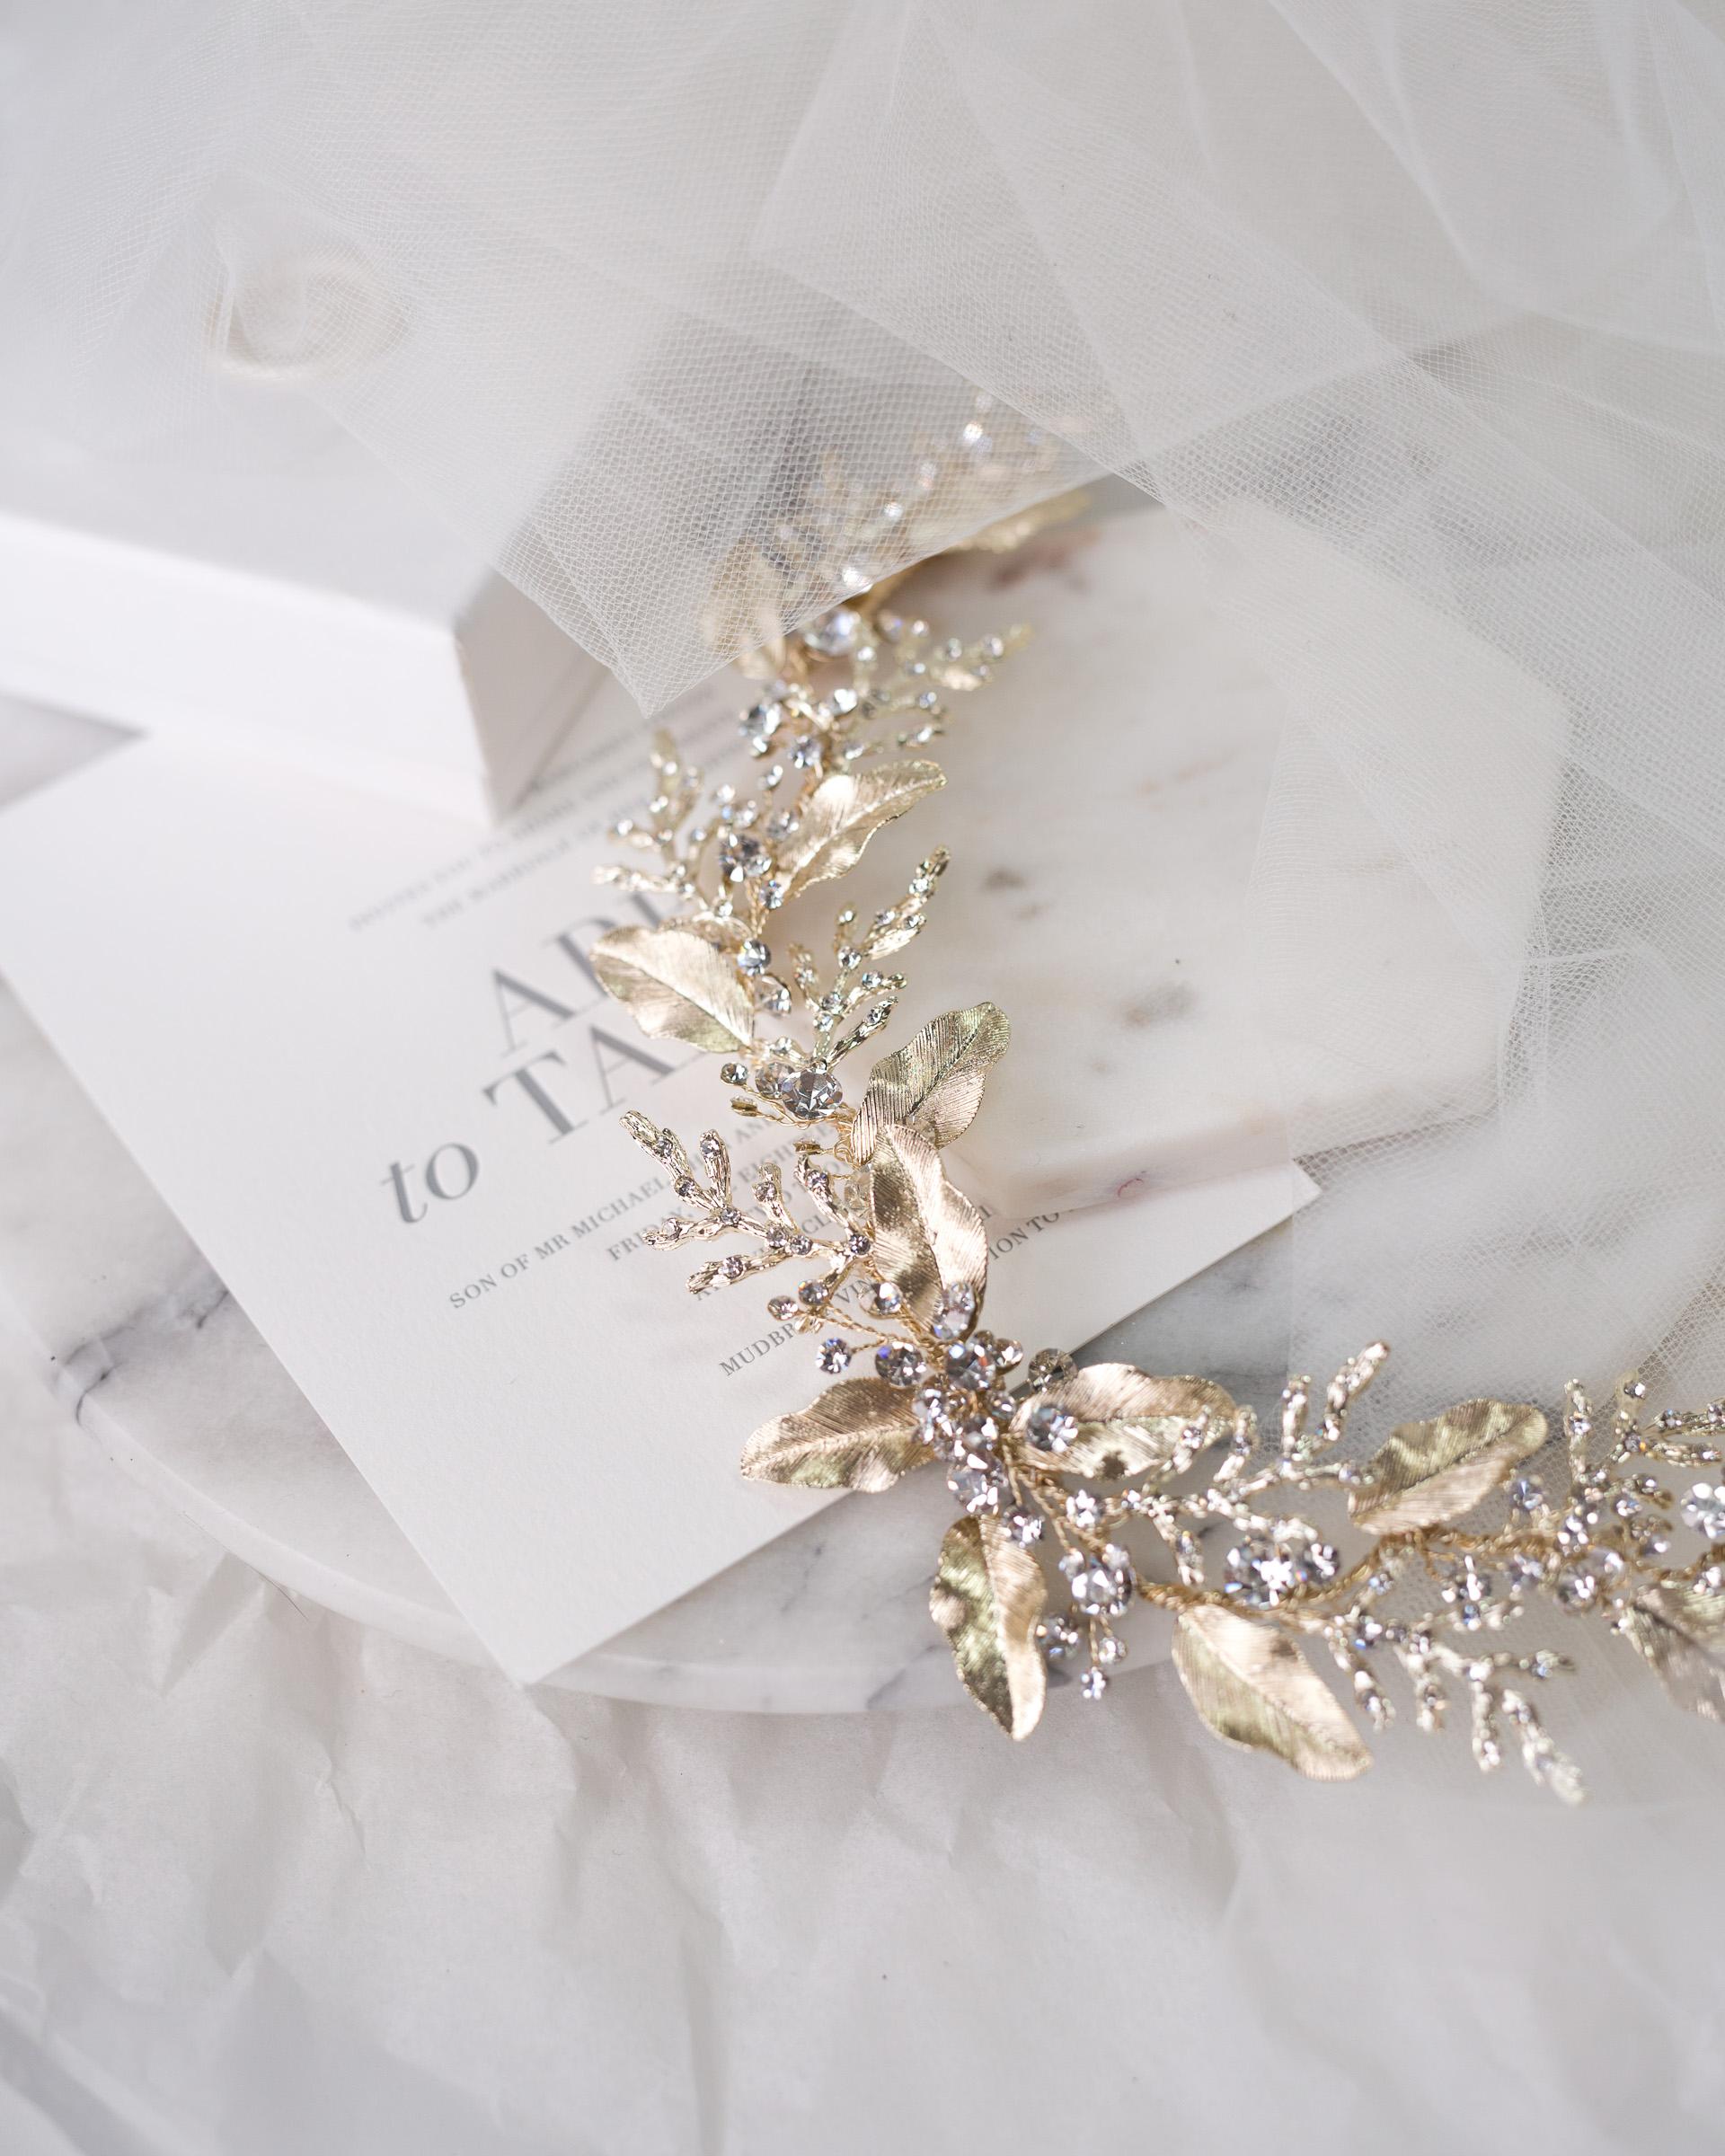 image - Jesseandjessie // Accessories Hera Couture